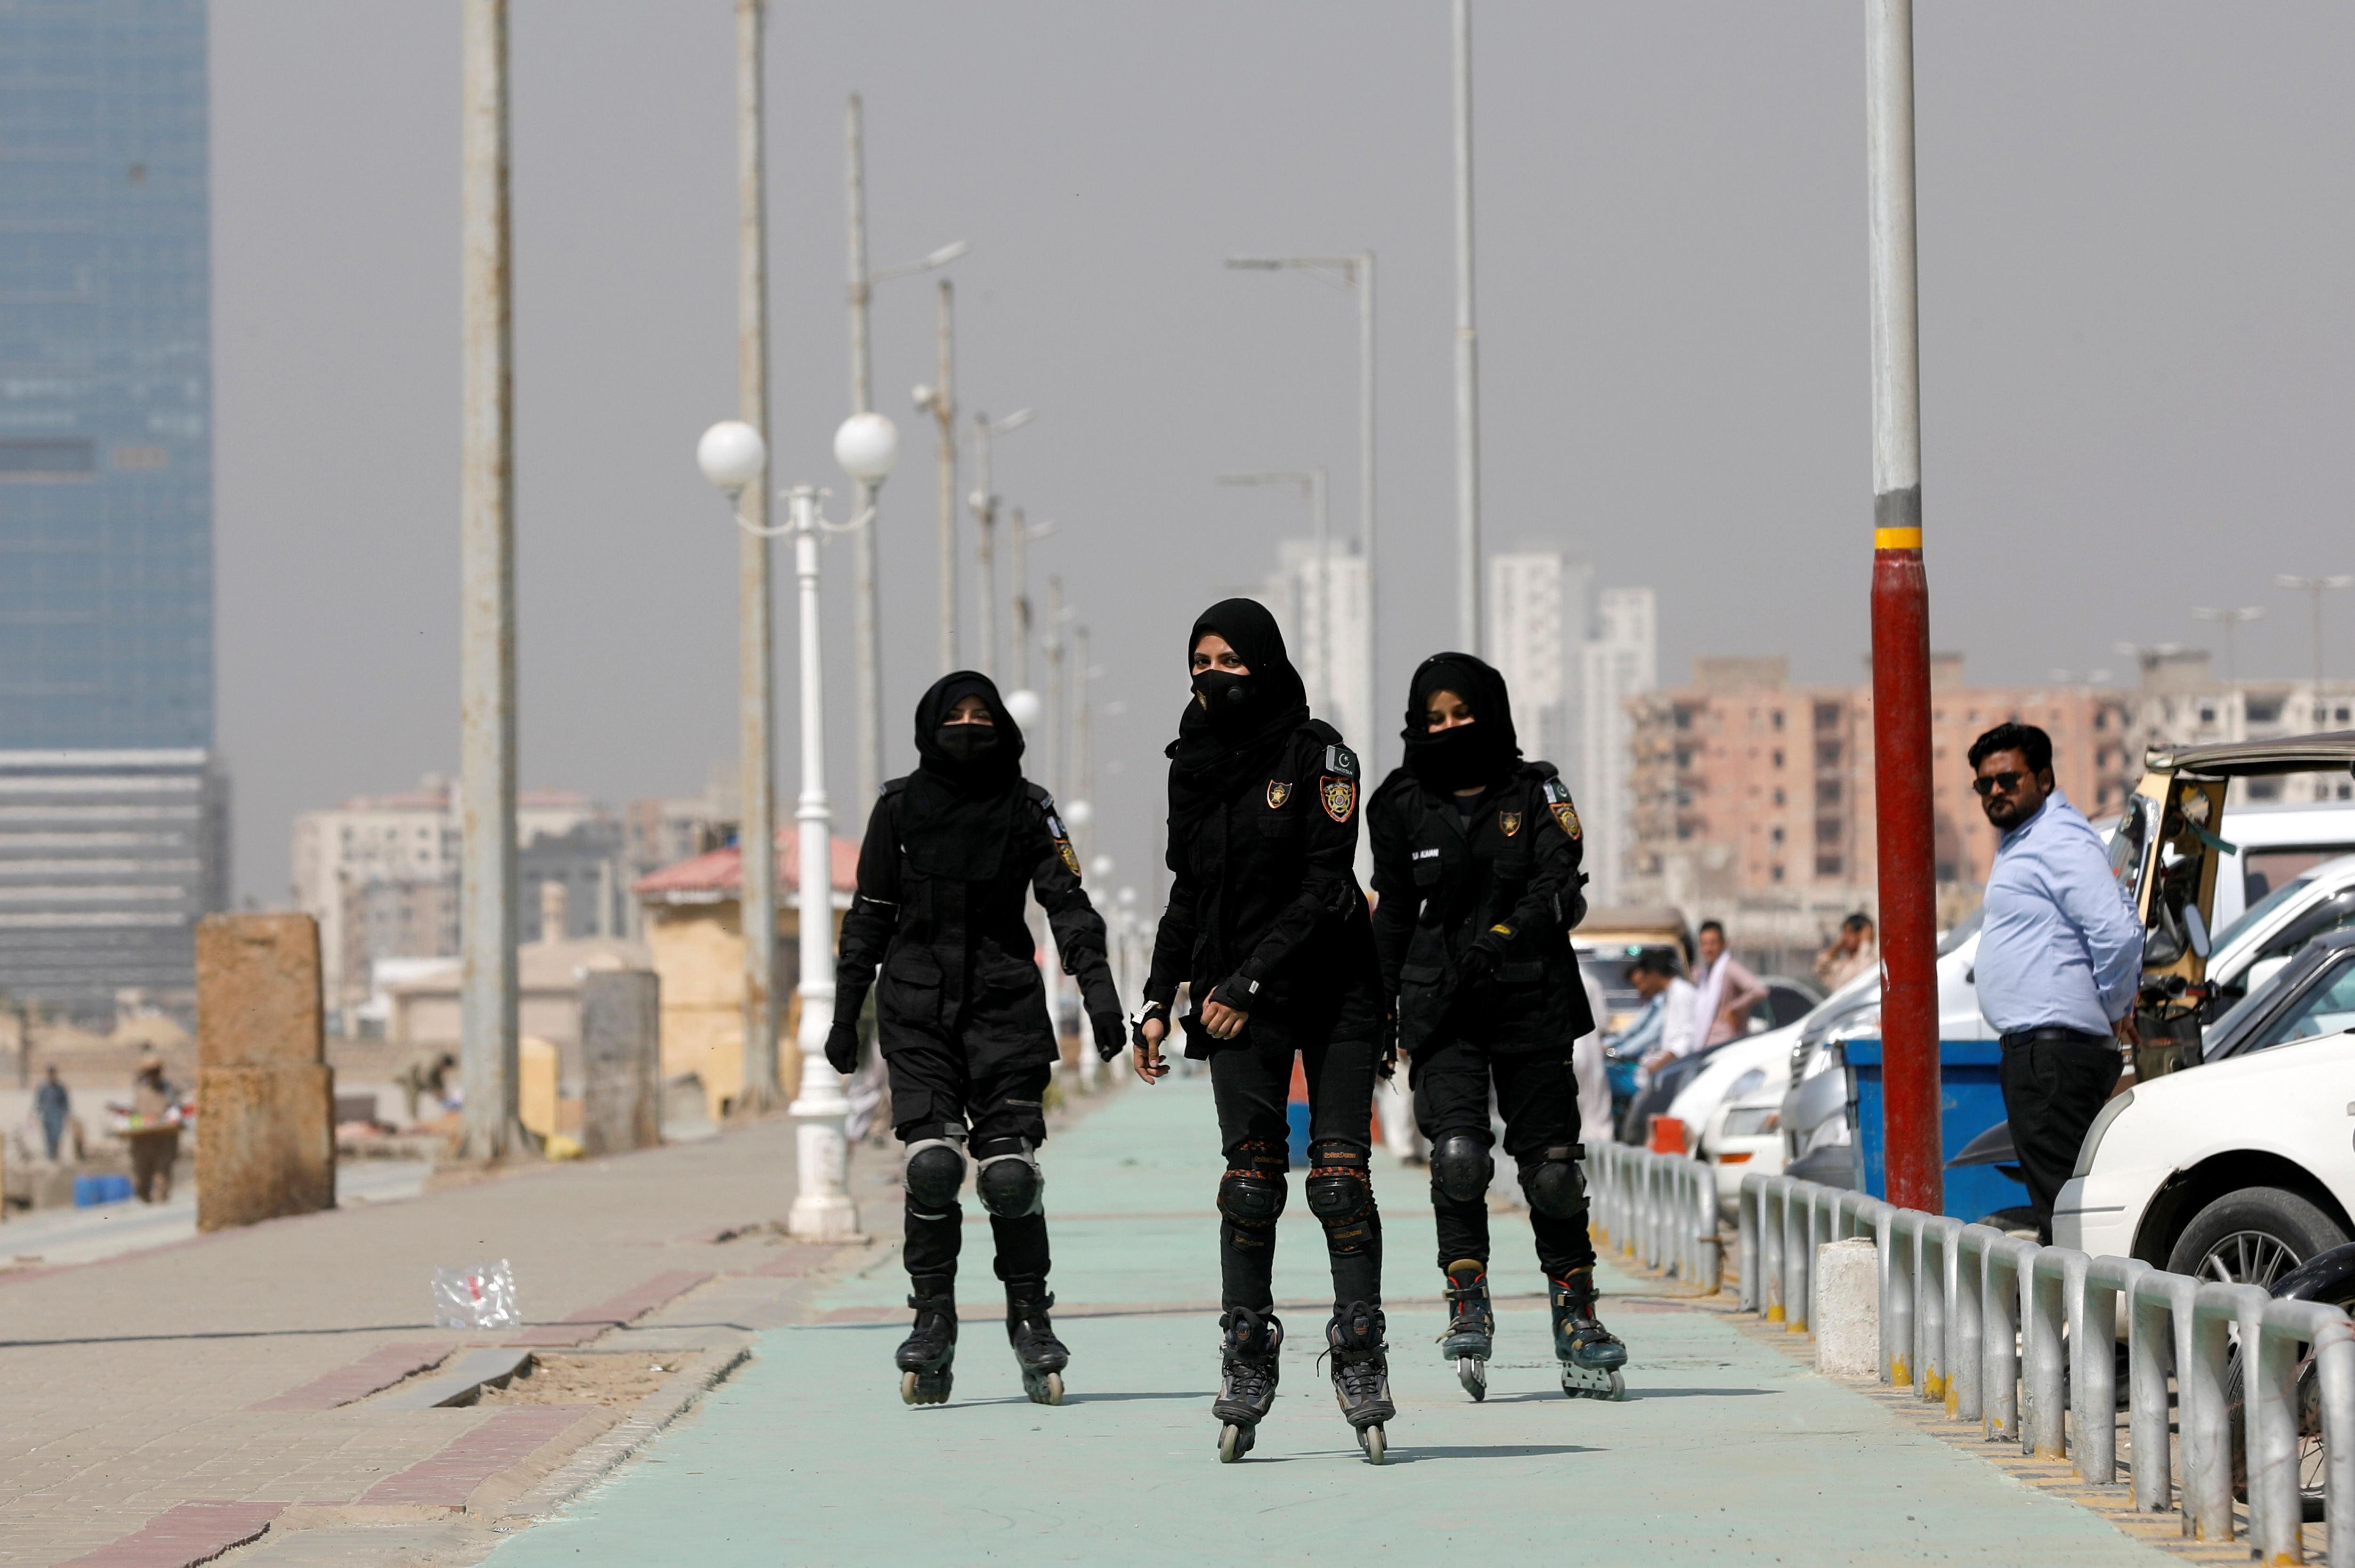 Karachi rollerblading police